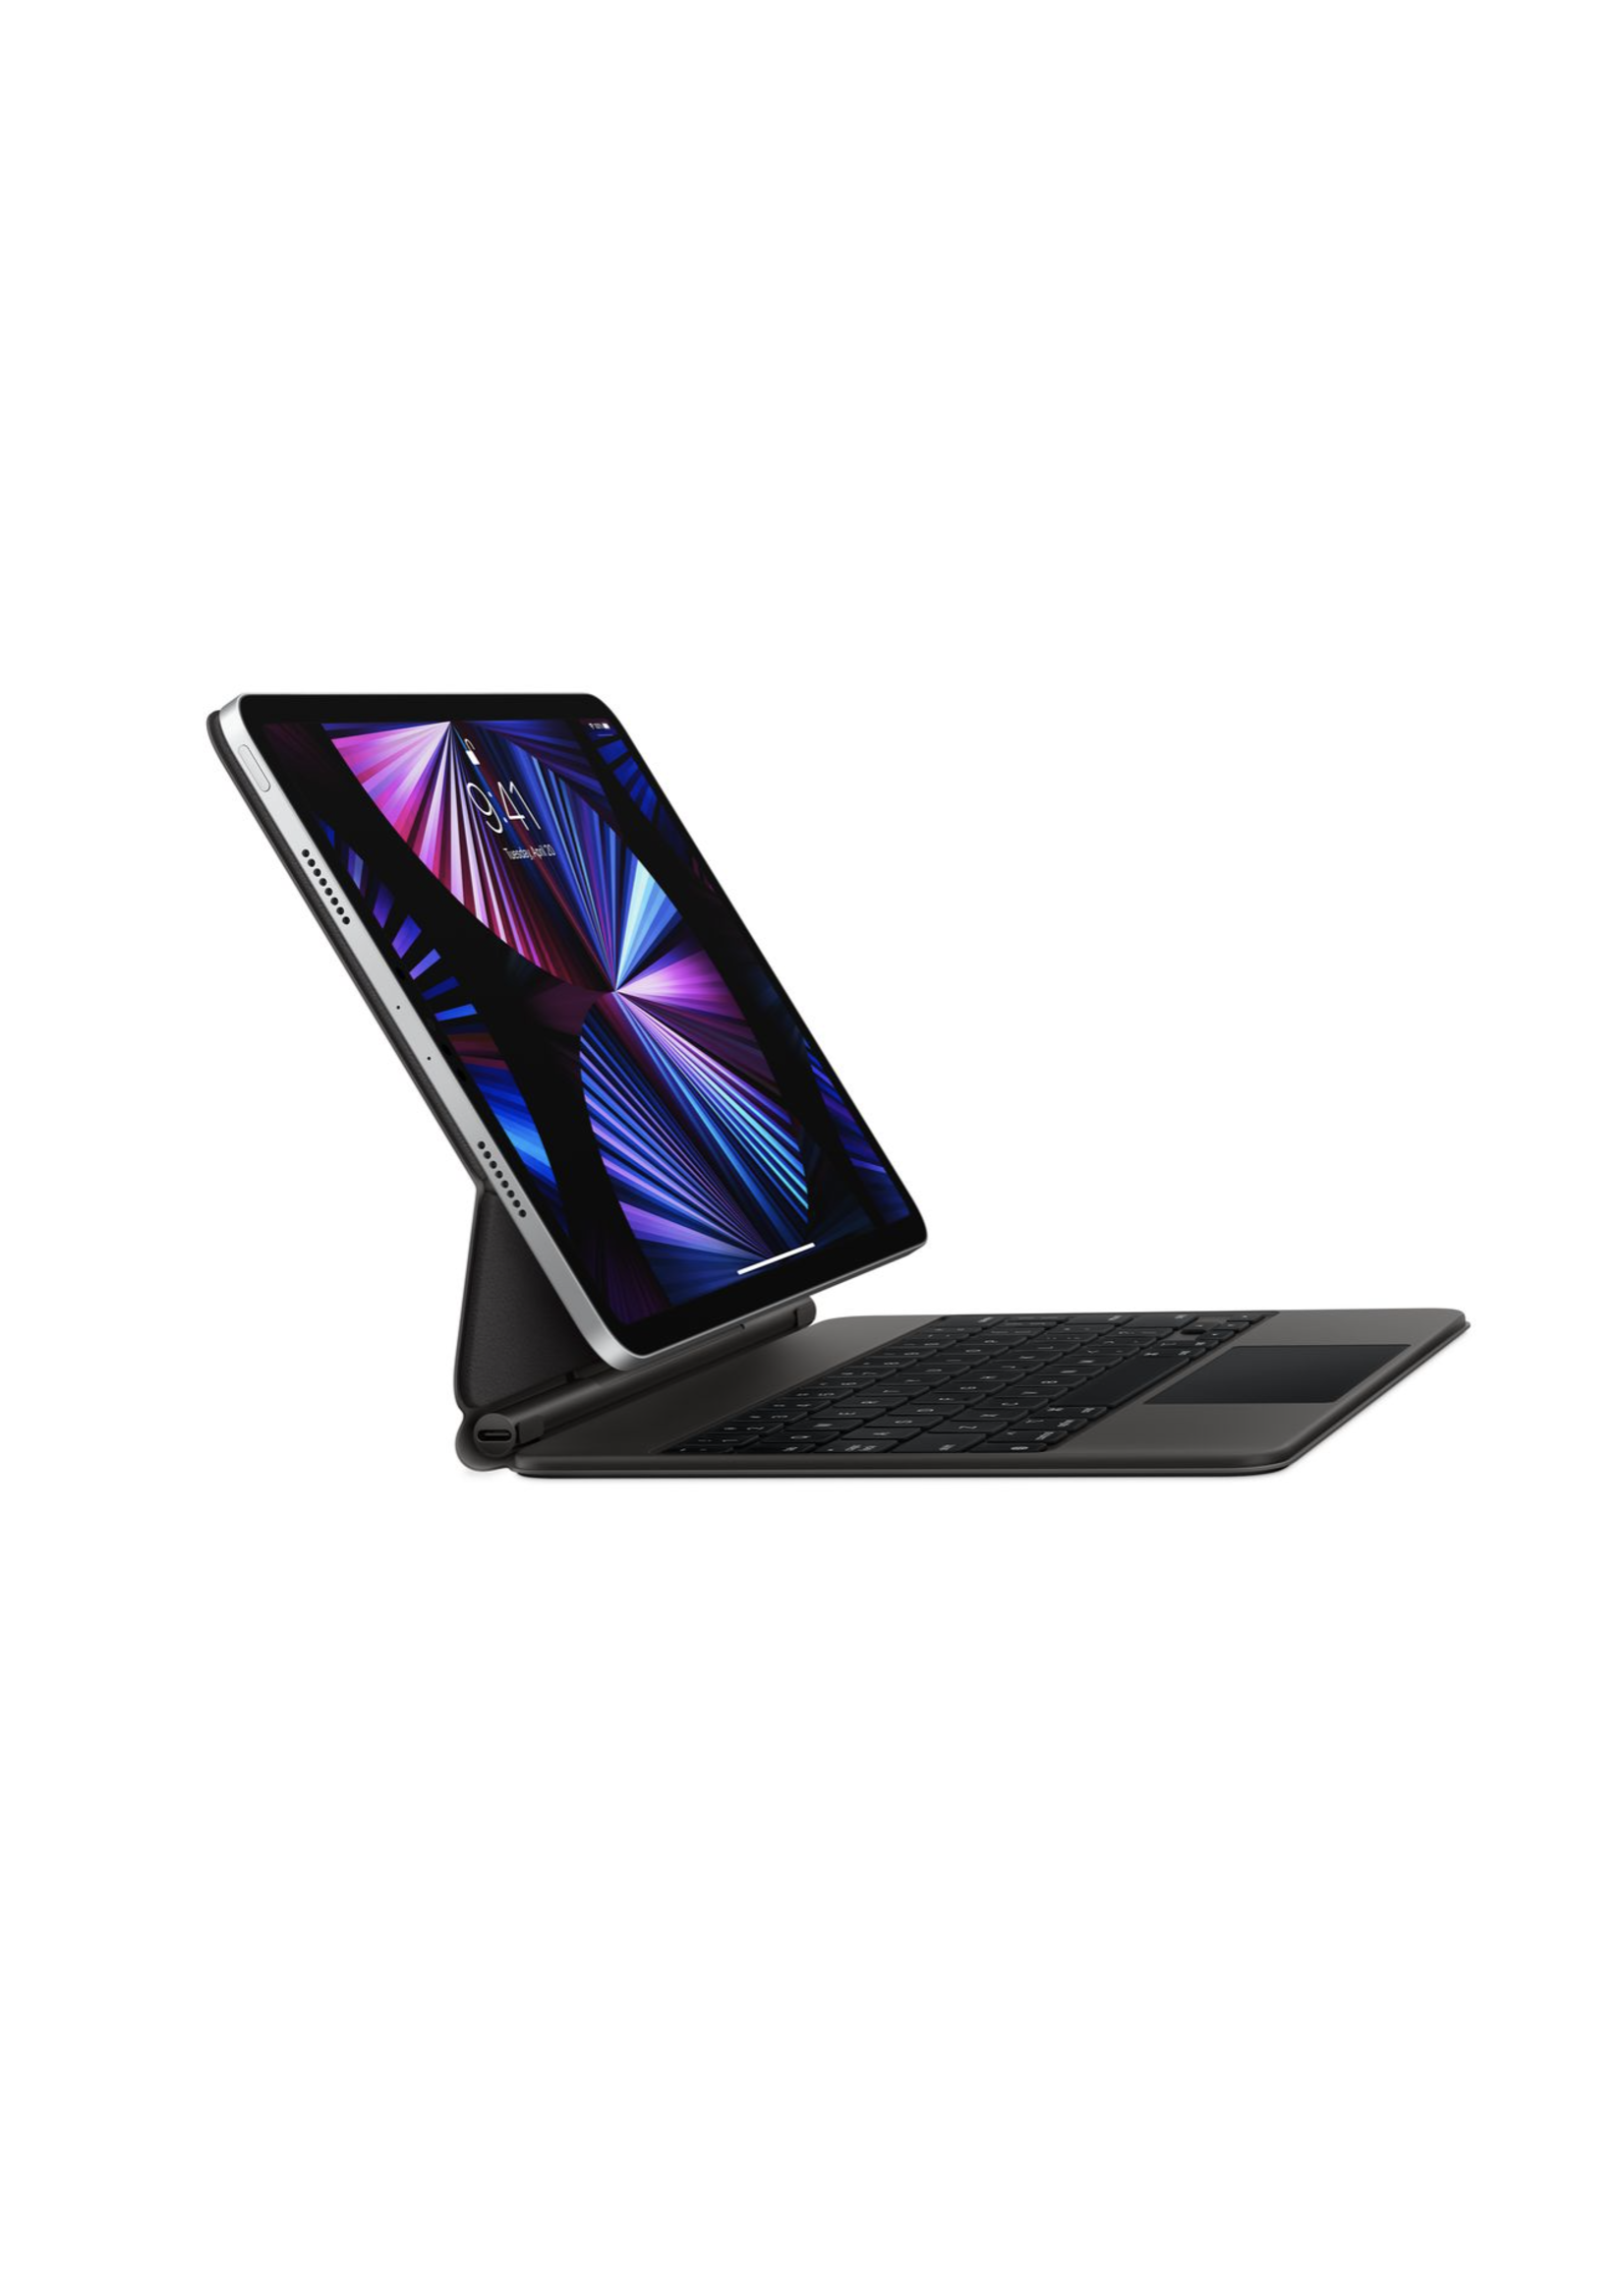 Apple Magic Keyboard for iPad Pro 11-inch and iPad Air